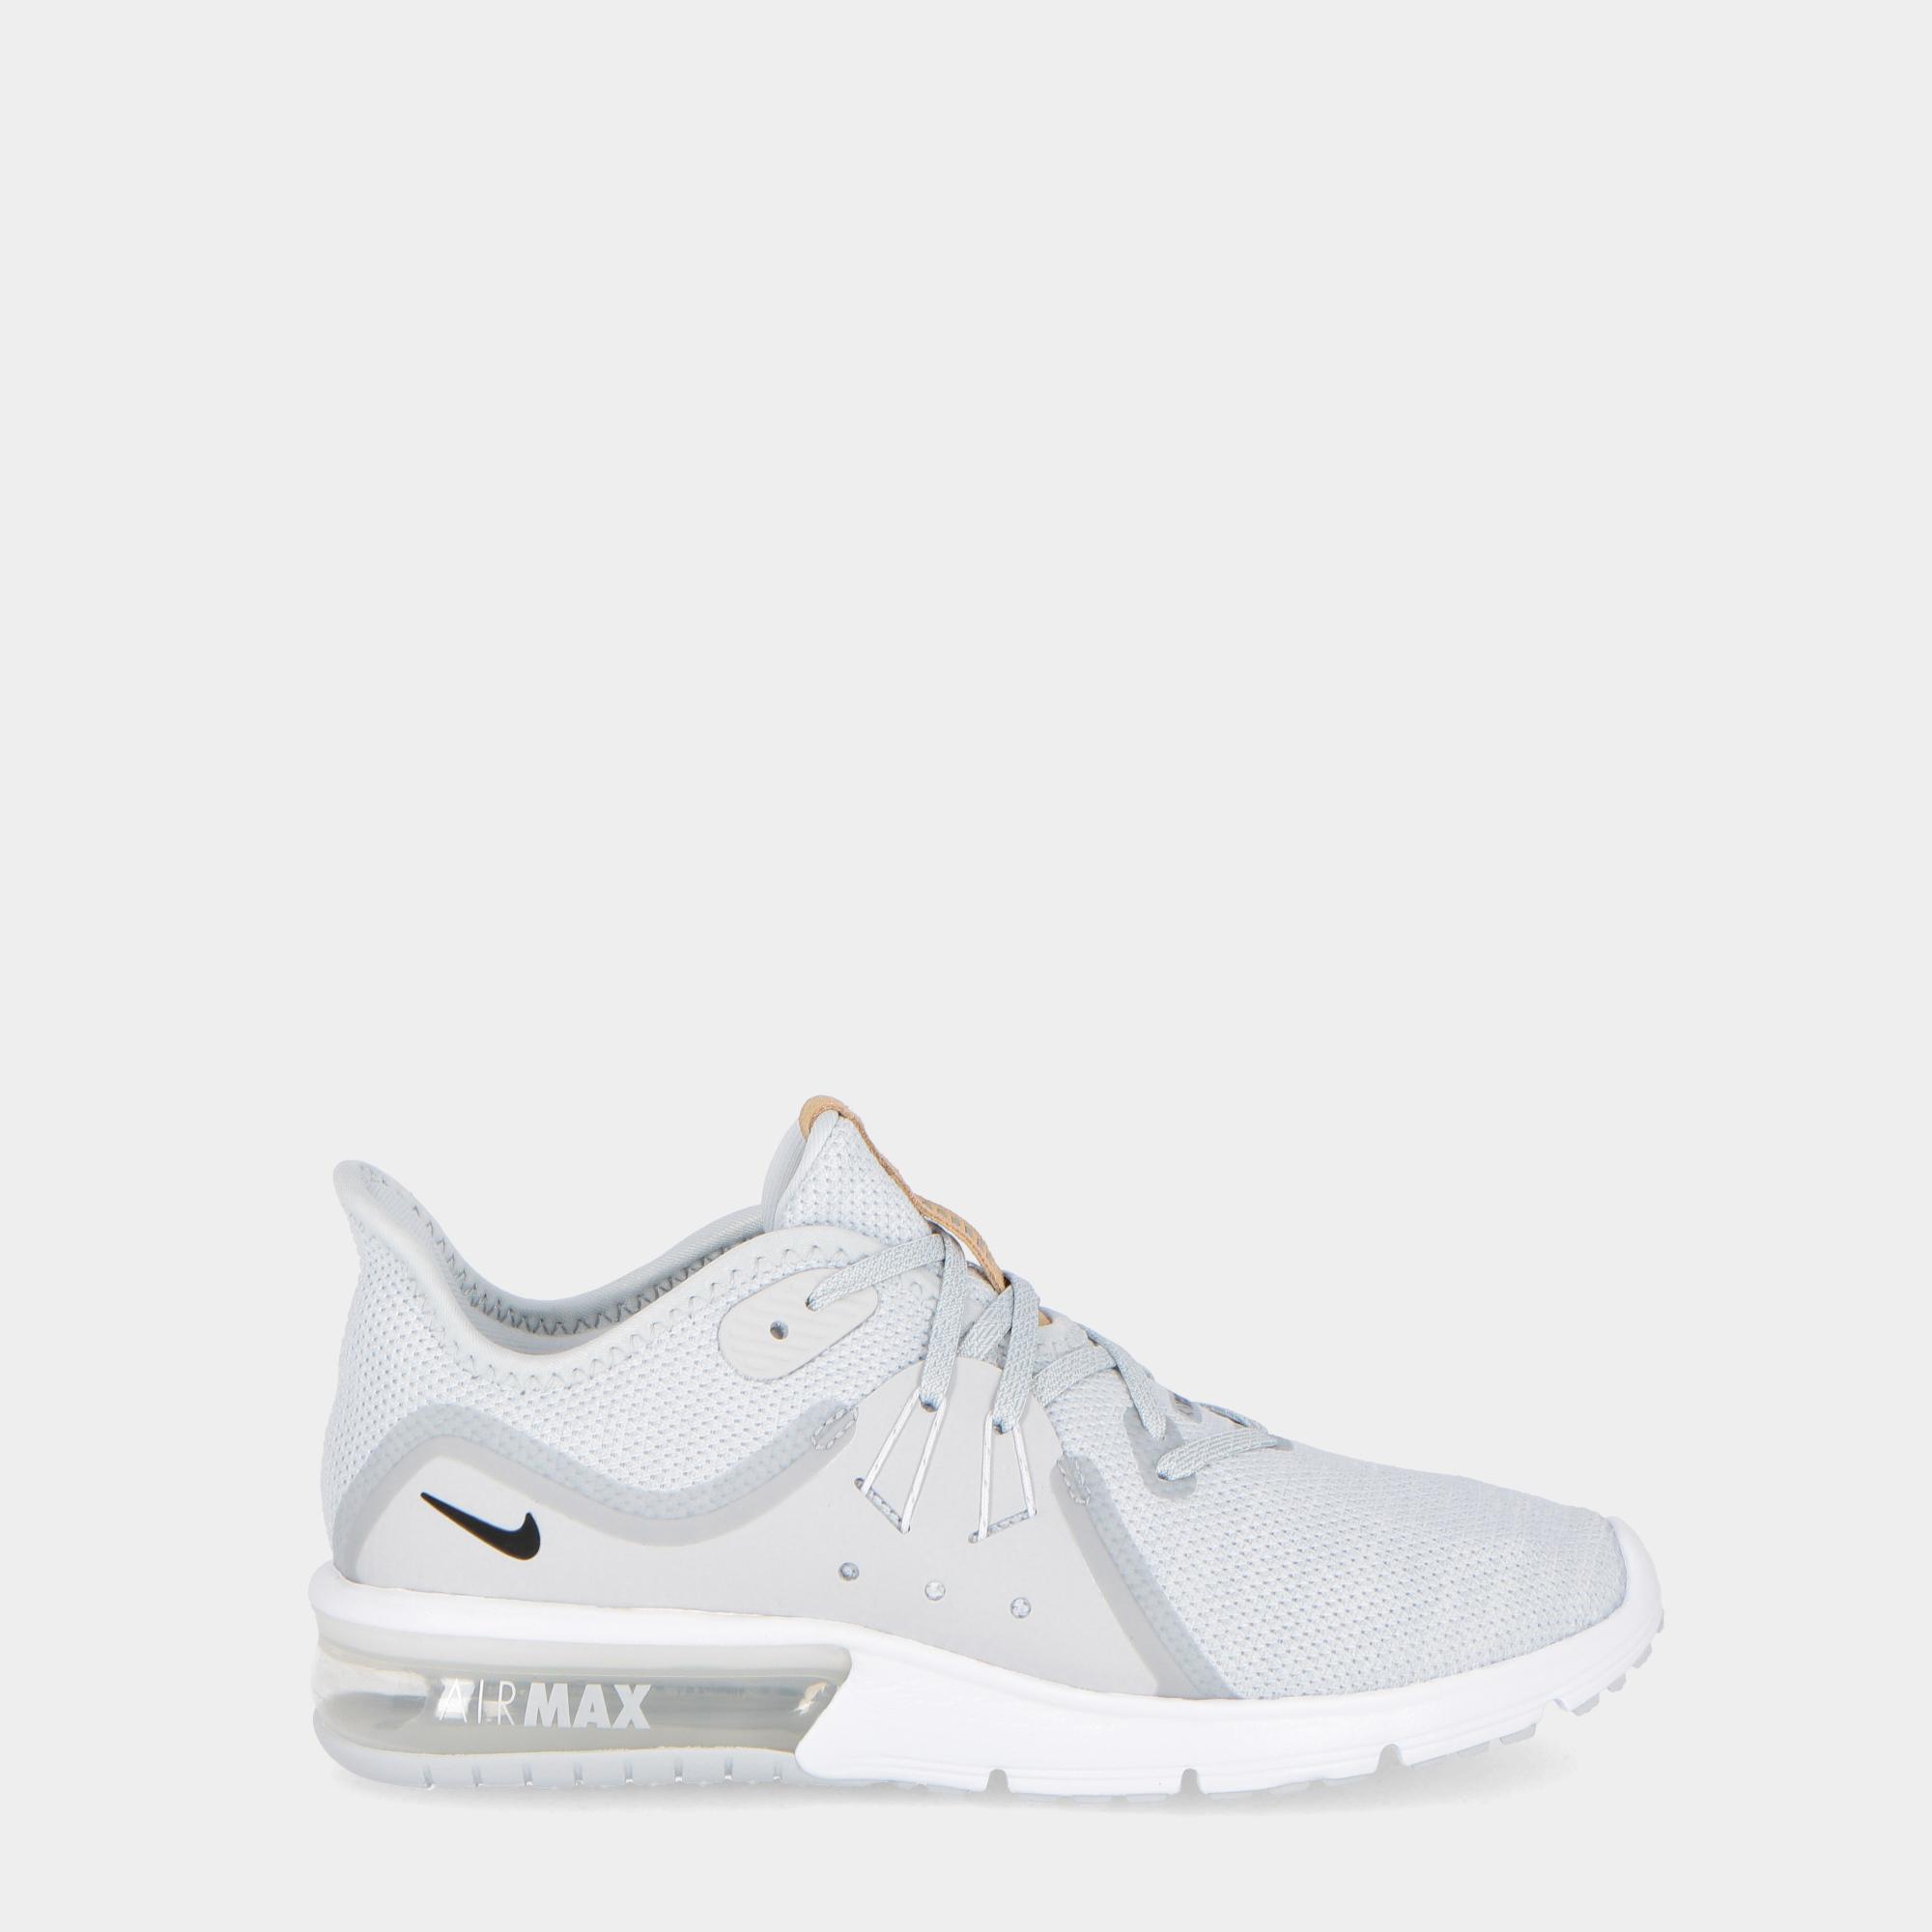 newest fbb7f f1630 Nike Air Max Sequent 3 Platinum black white